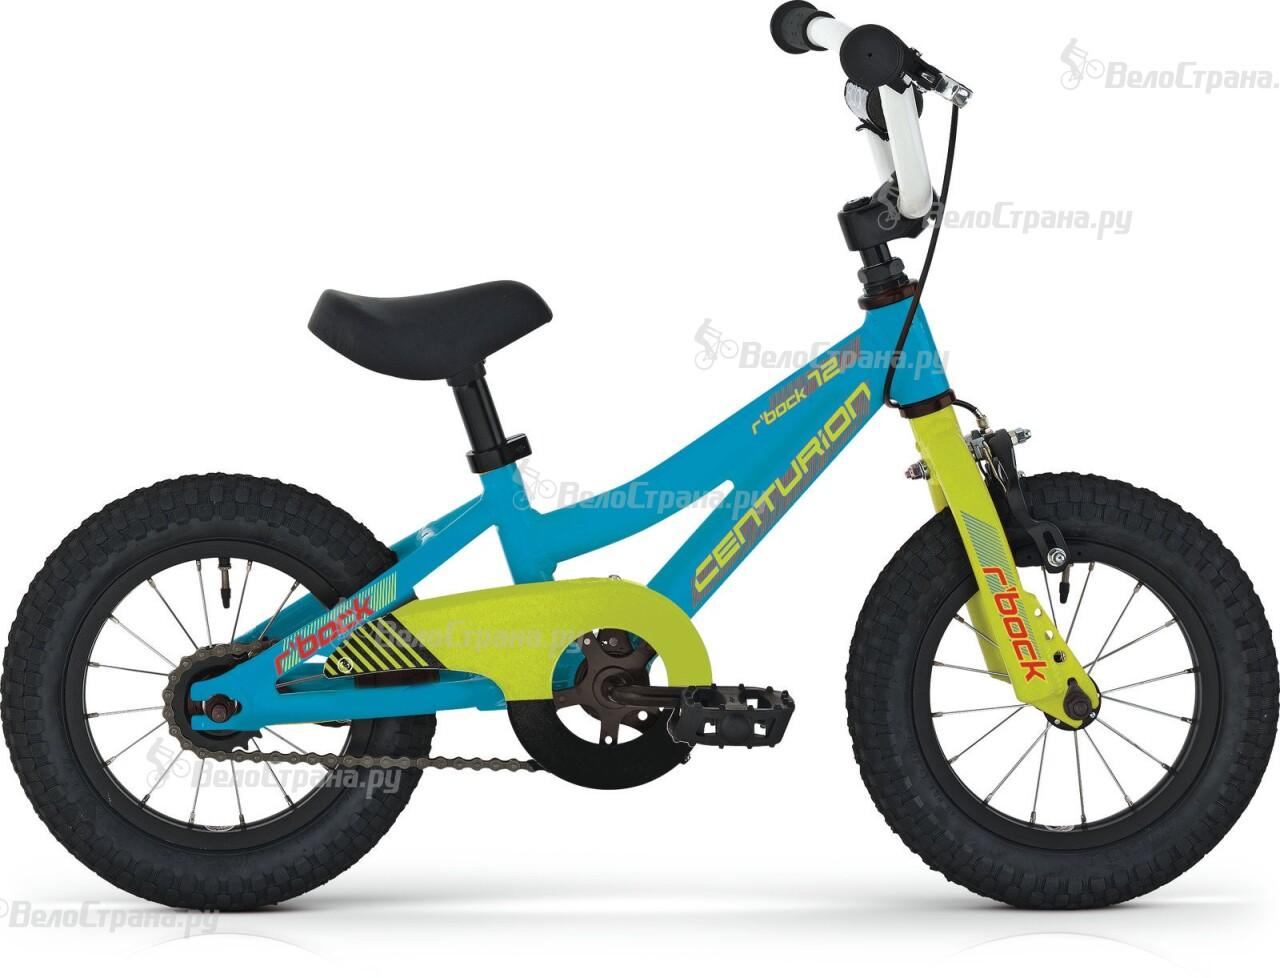 Велосипед Centurion R' Bock 12 (2016) корсет otto bock